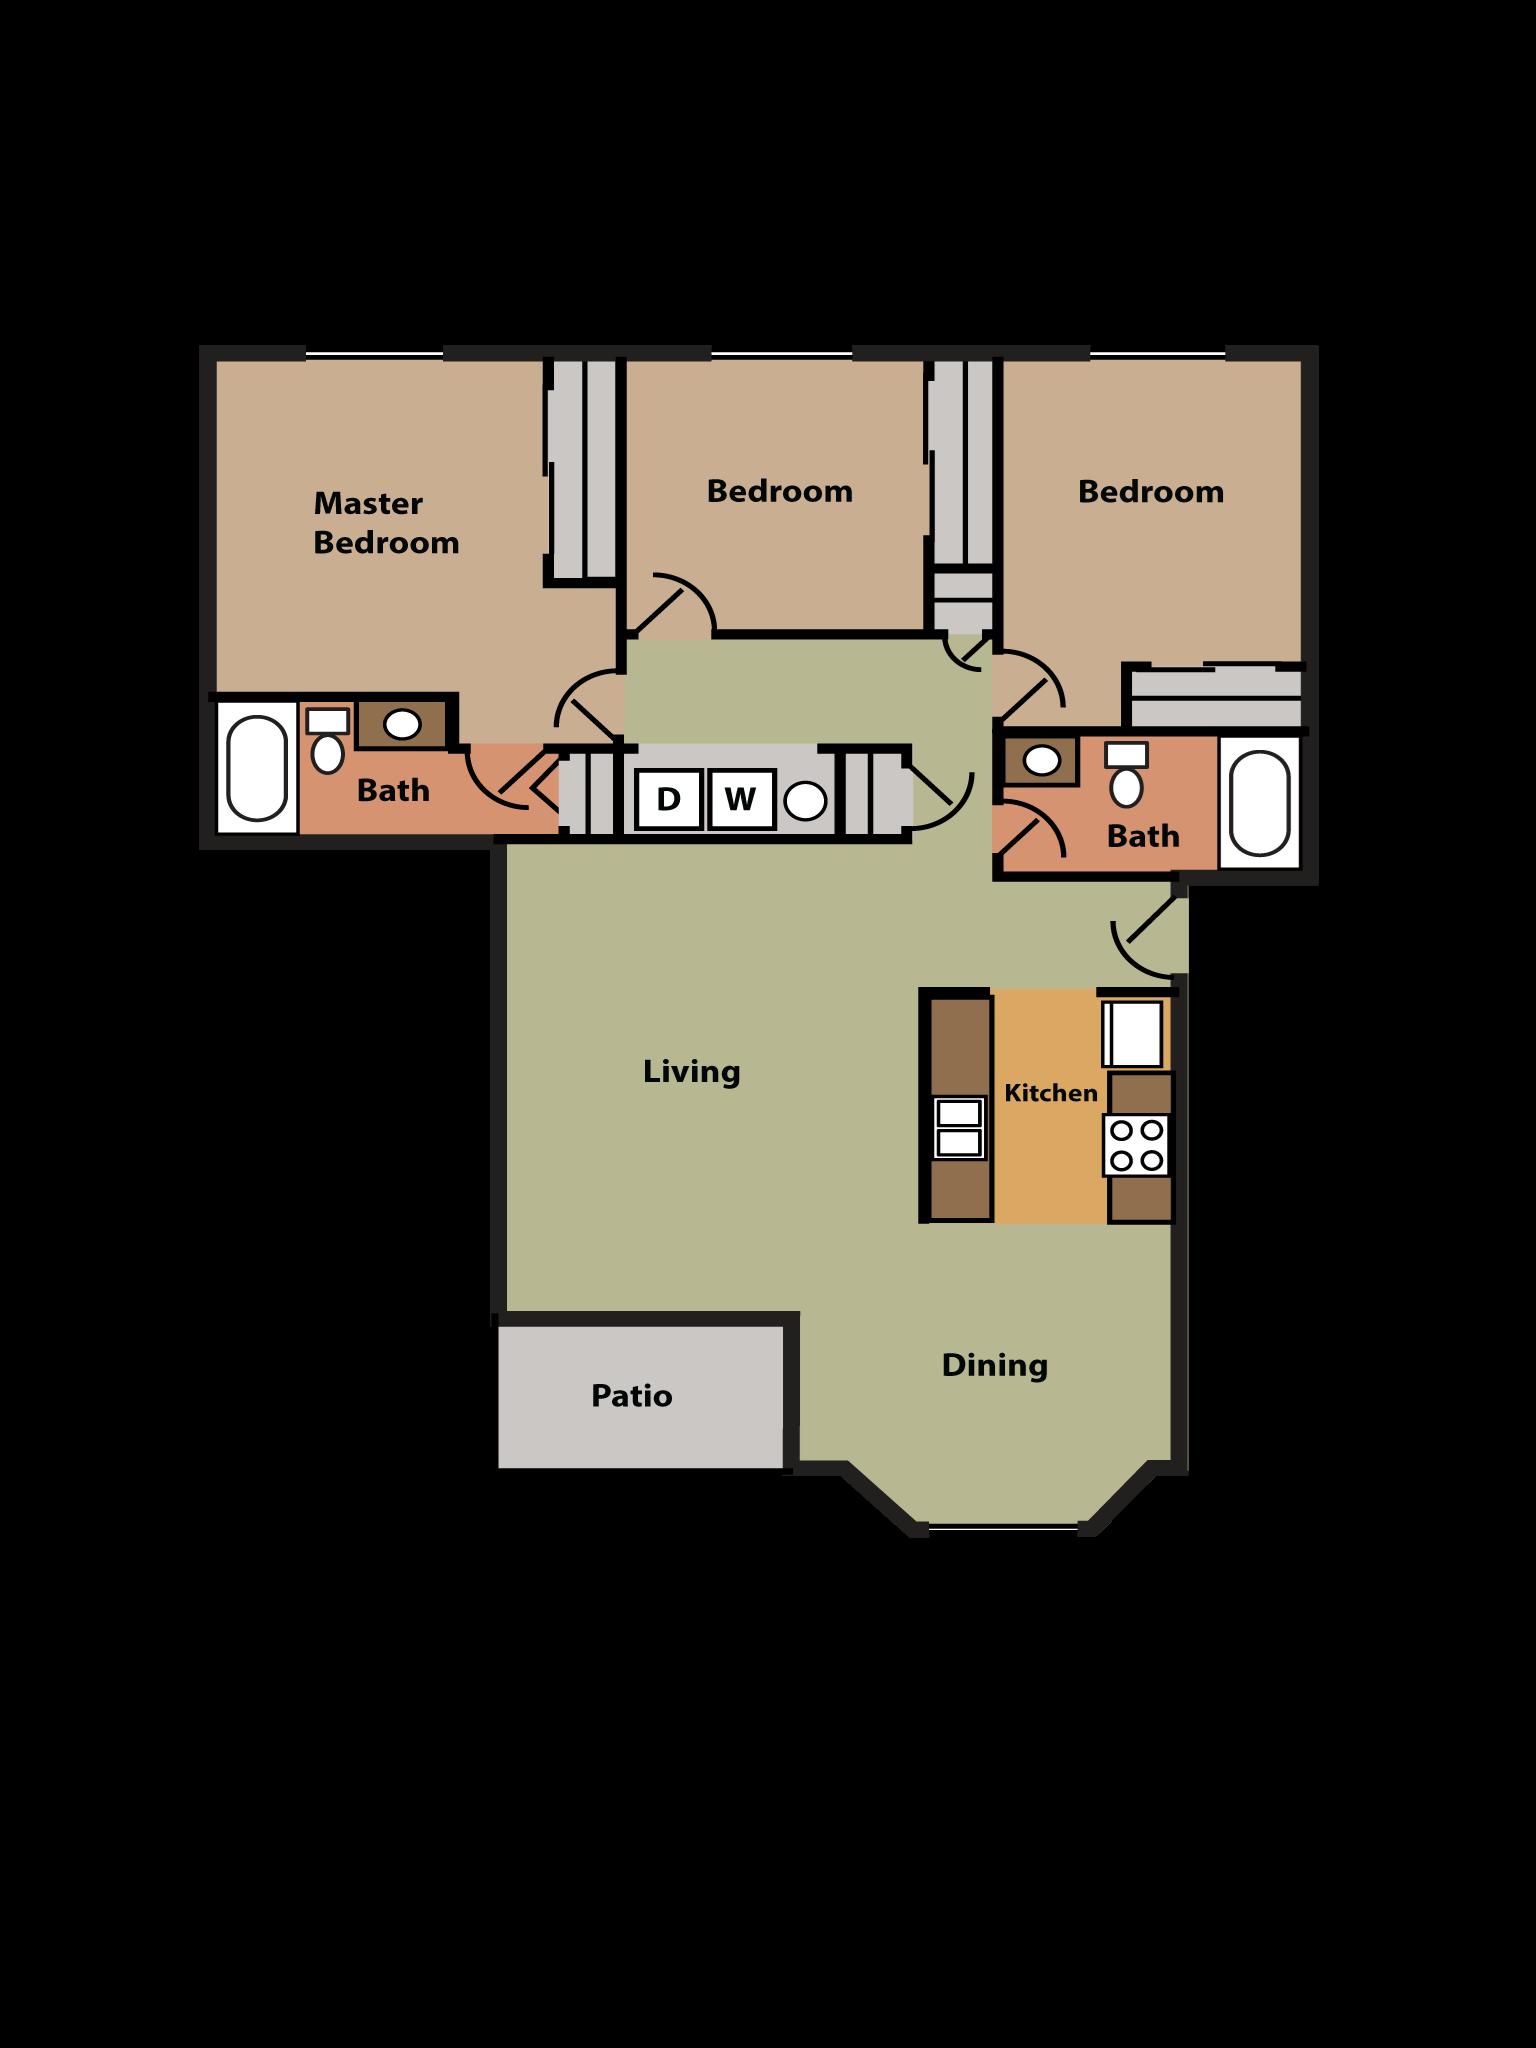 3 Bed, 2 Bath w/ Bay Window Floor Plan 6